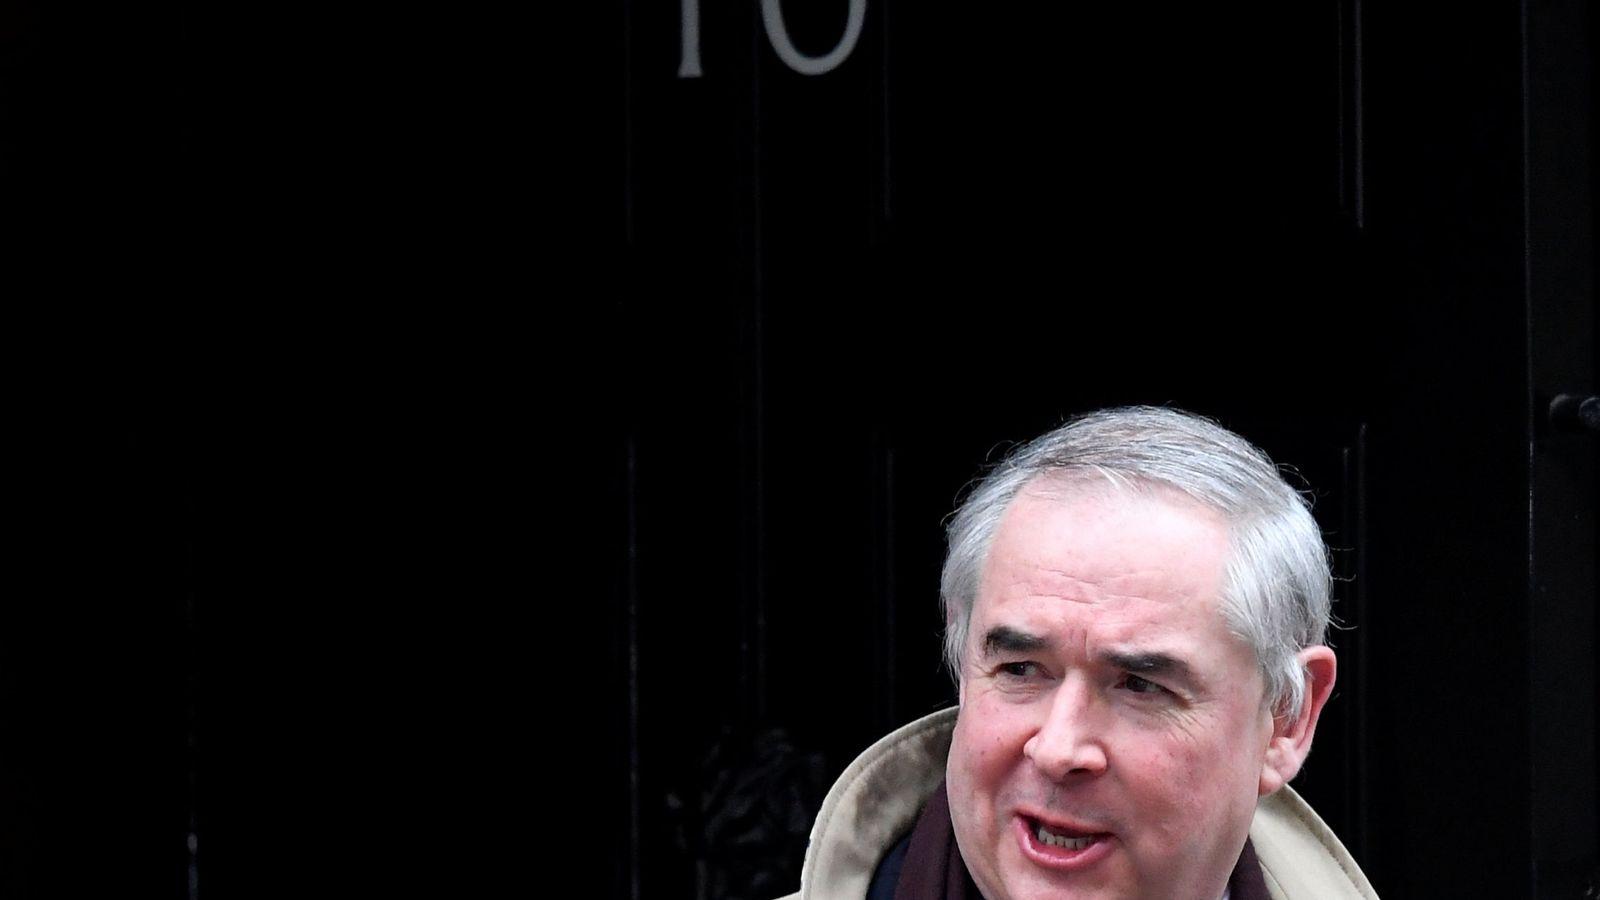 Foto: El fiscal general británico Geoffrey Cox en Downing Street, Londres. (Reuters)